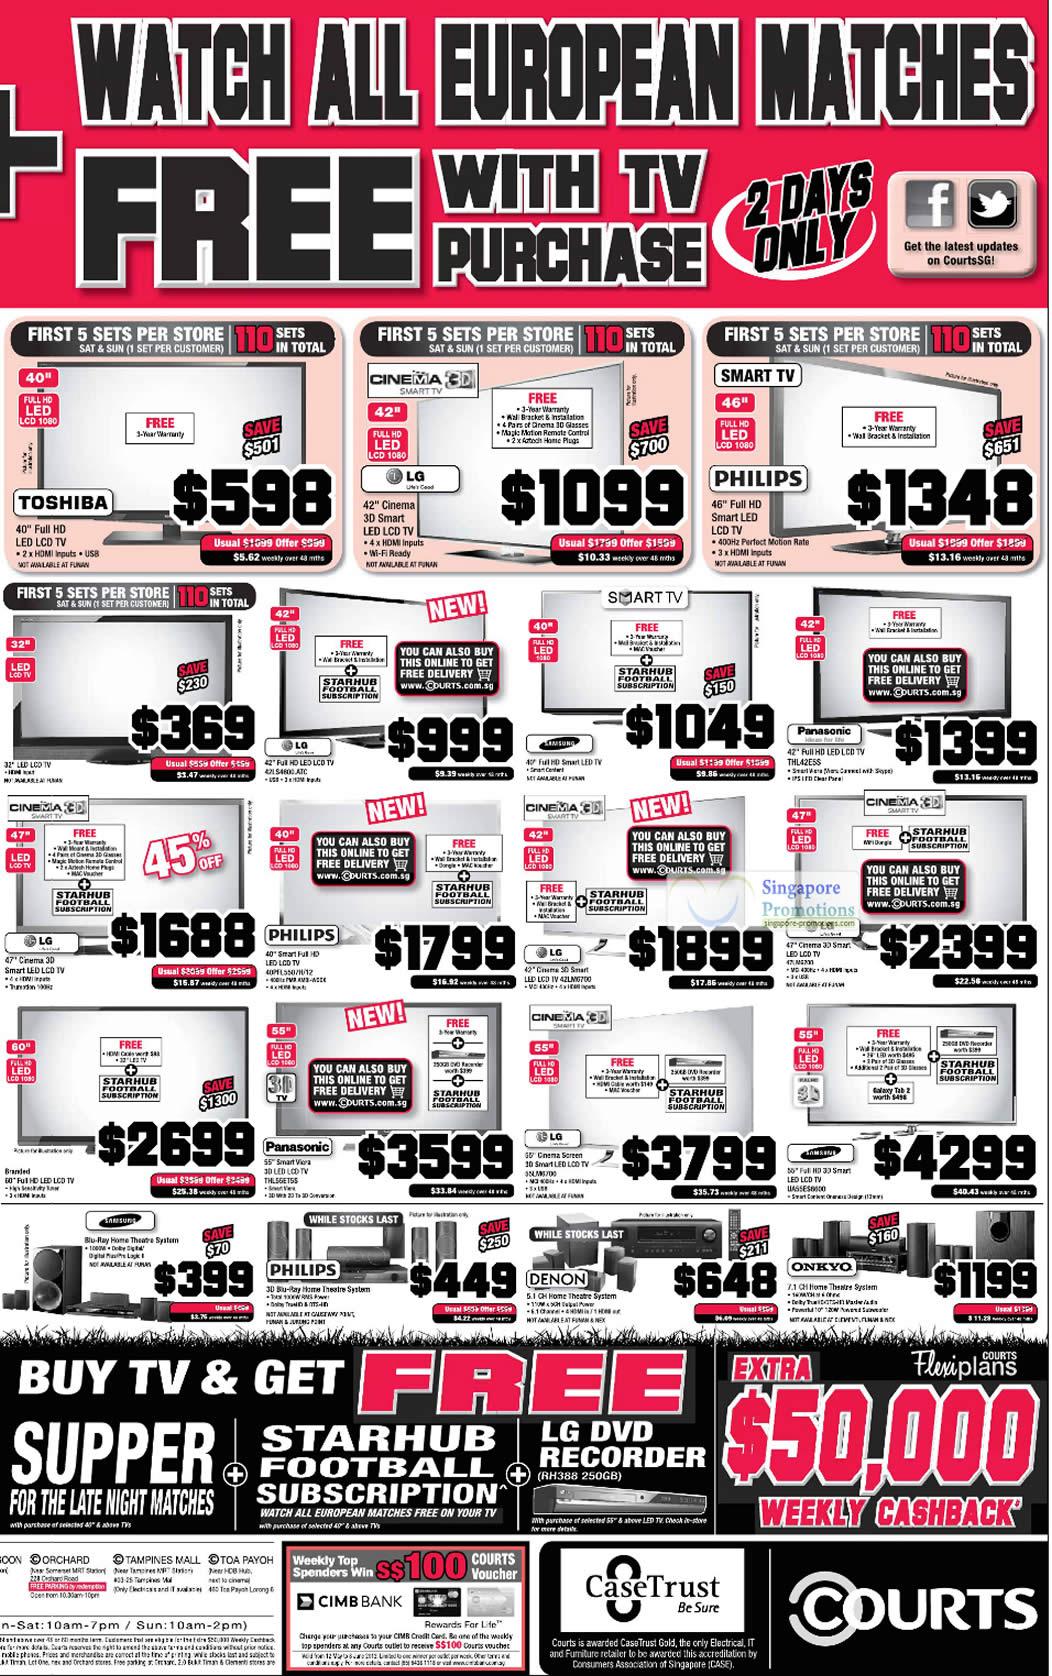 LED TVs, LCD TVs, Home Theatre Systems, Toshiba, LG, Philips, Panasonic, Samsung, Denon, Onkyo